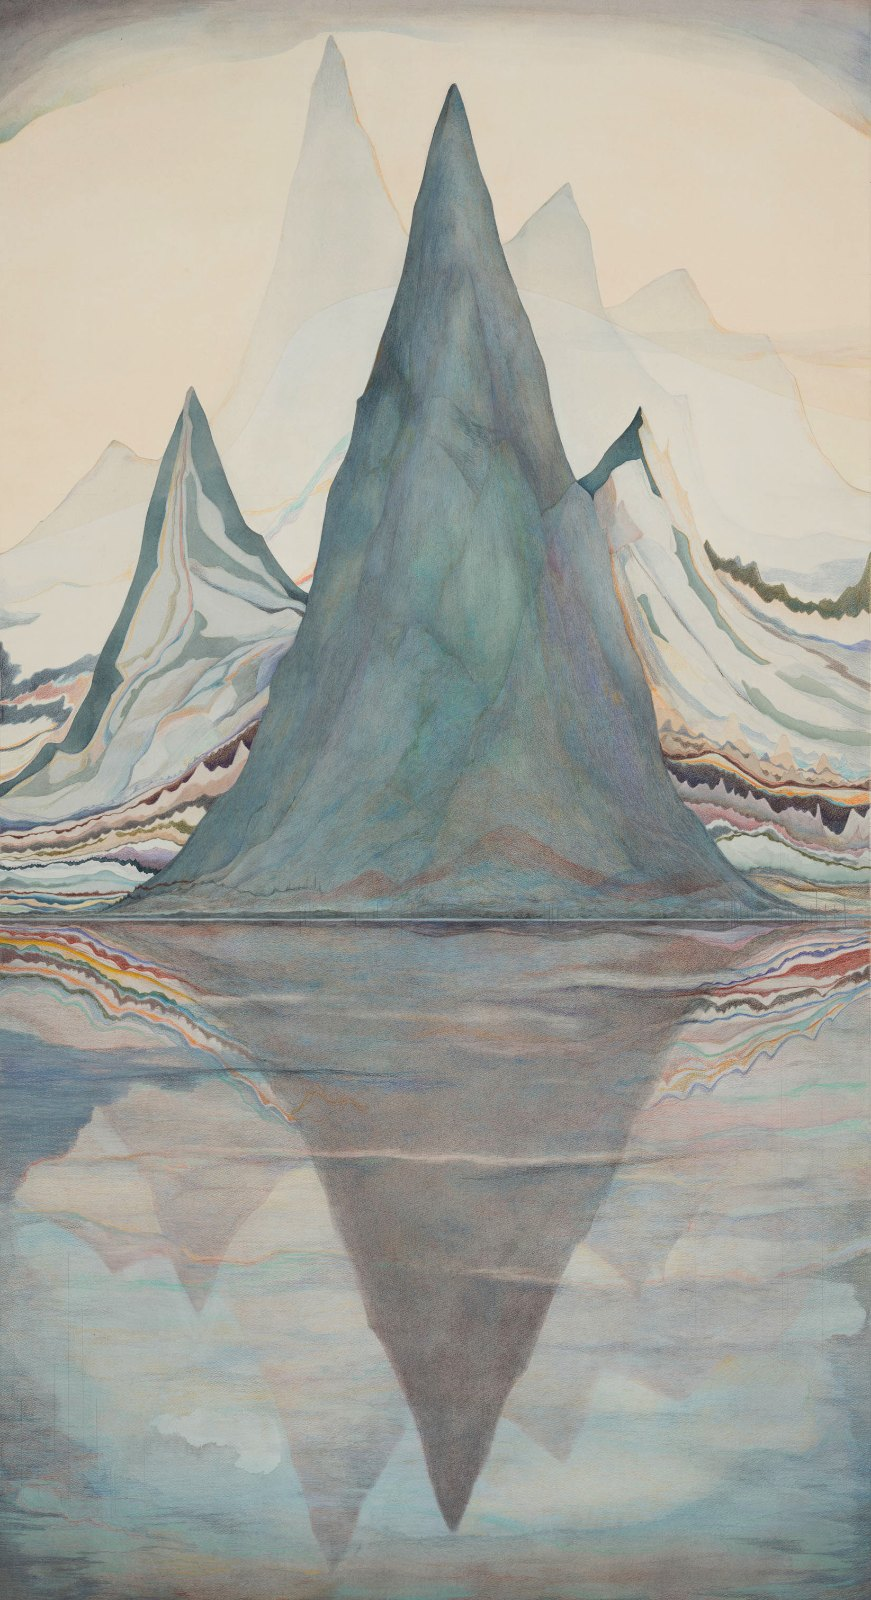 Ljudgraf, 2013, watercolour and water-soluble colour pencil on paper, 170 x 92 cm